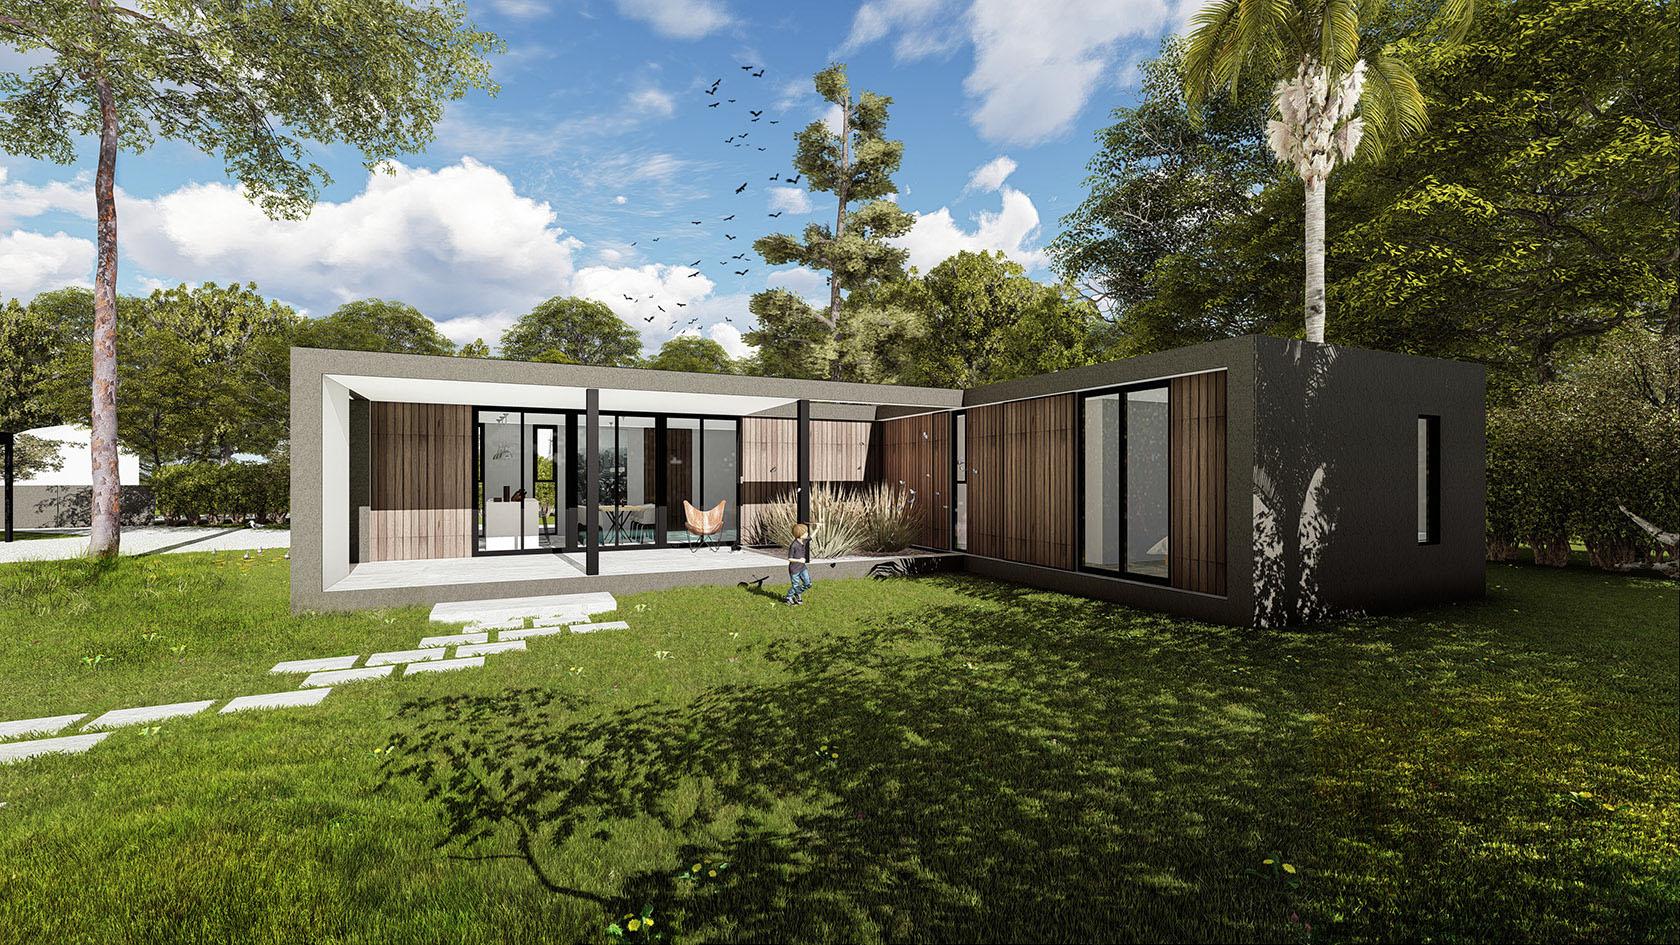 Casa con columnas negras, casas modernas en steel frame, fachadas vidriadas y madera contemporáneas